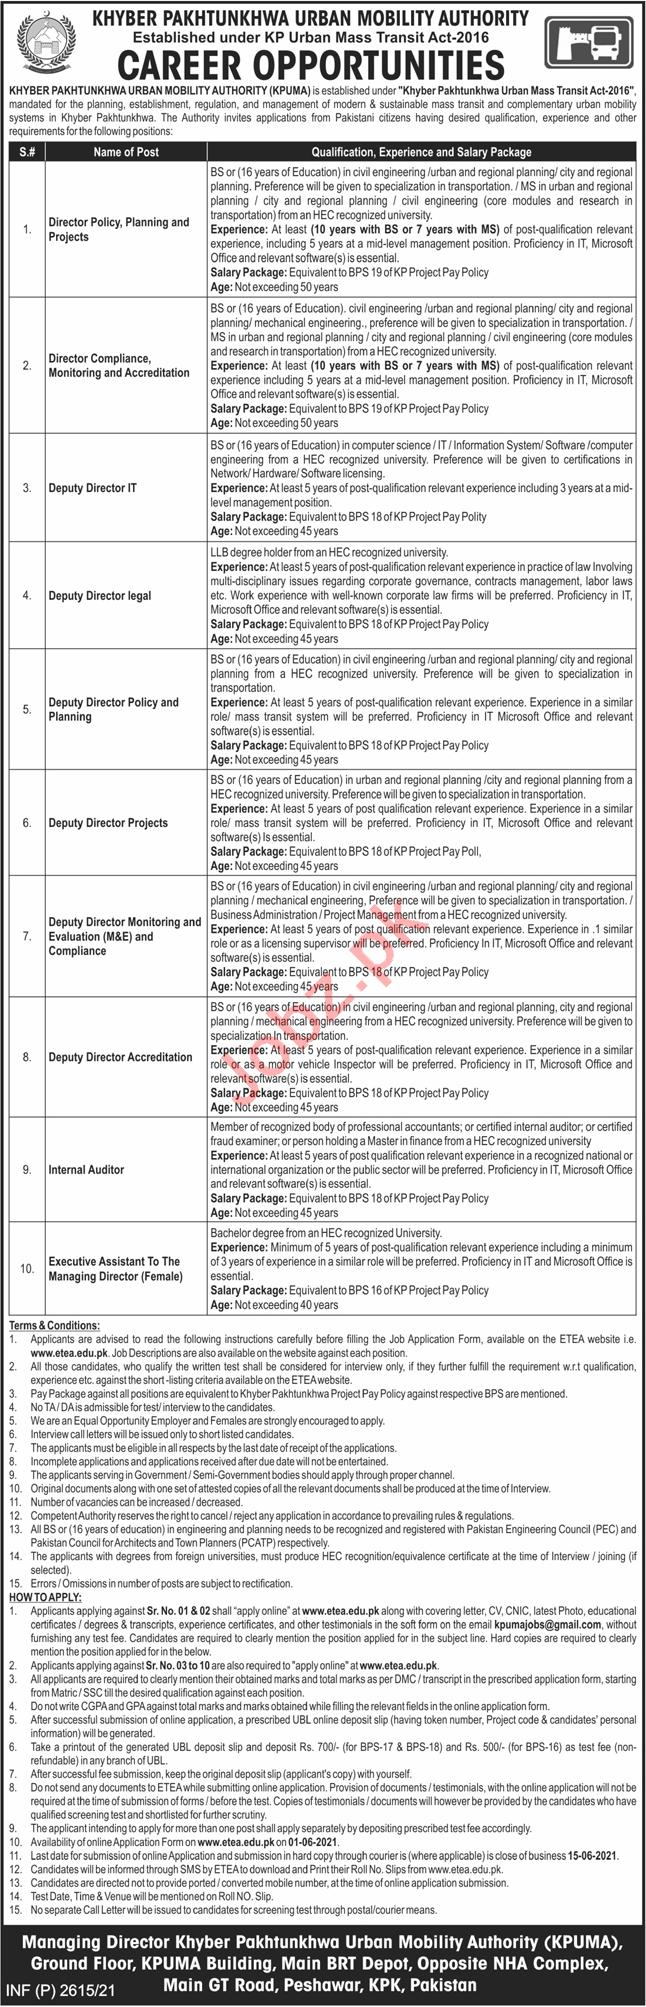 Khyber Pakhtunkhwa Urban Mobility Authority KPUMA Jobs 2021